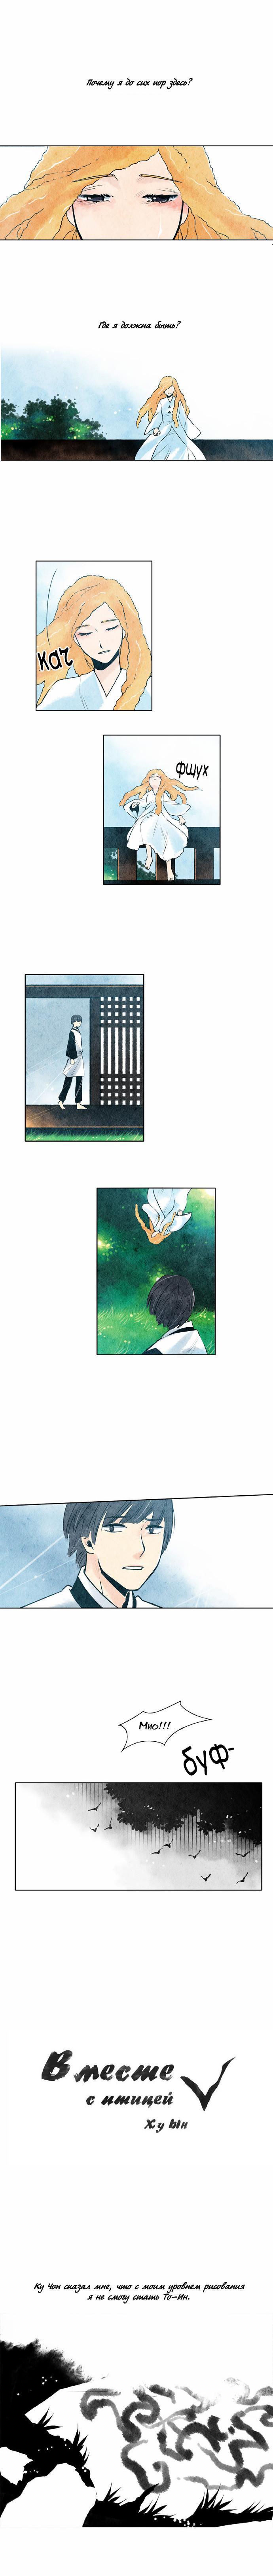 https://r1.ninemanga.com/comics/pic2/39/22503/416379/1532884319459.jpg Page 1